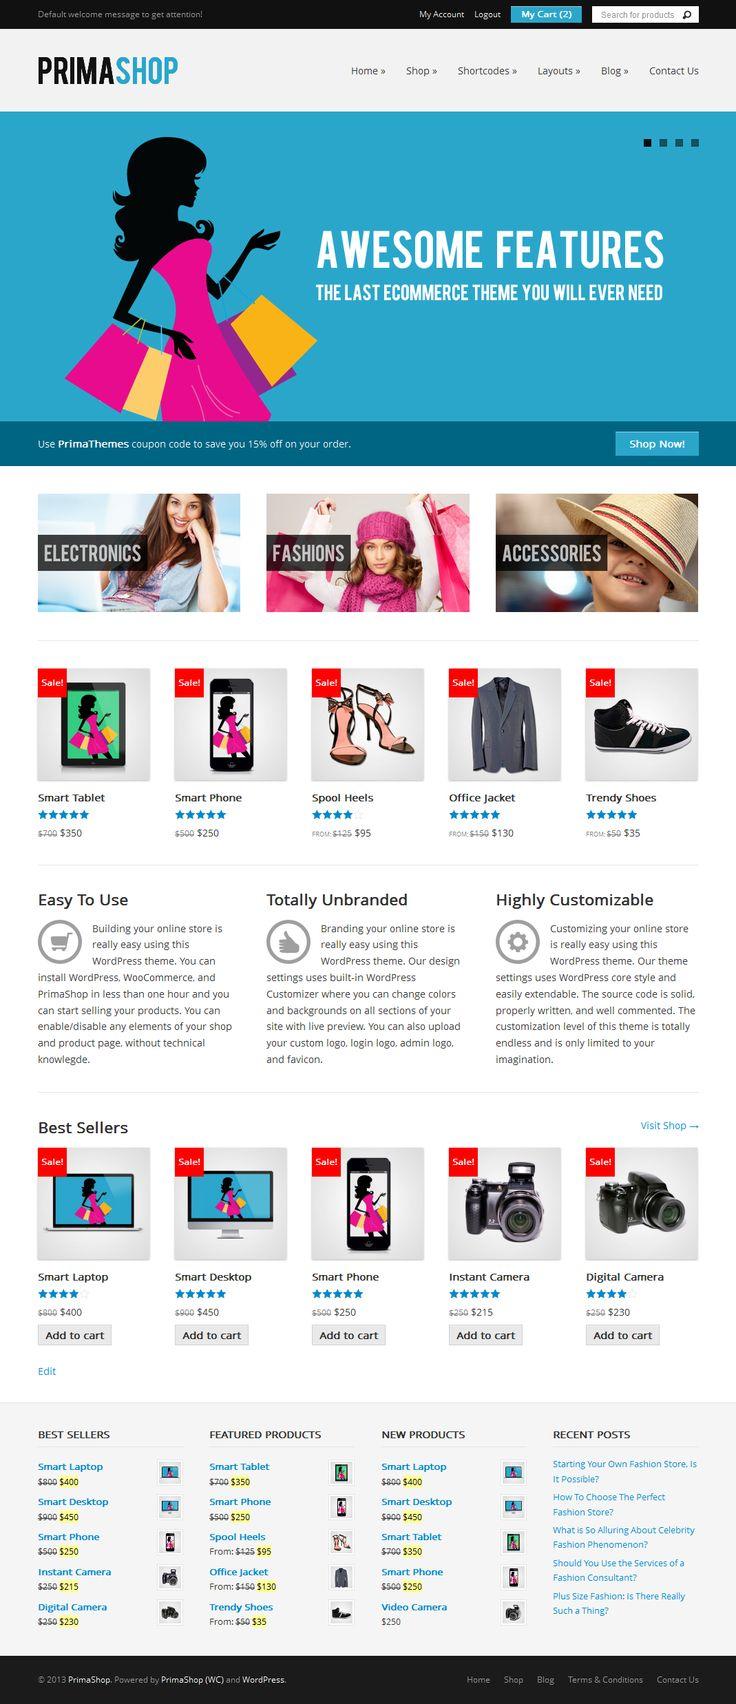 BEST eCommerce WordPress Themes of All Times (12 Themes + Bonus) http://www.wordpressawards.net/best-ecommerce-wordpress-themes/ #ecommerce #wordpress #themes